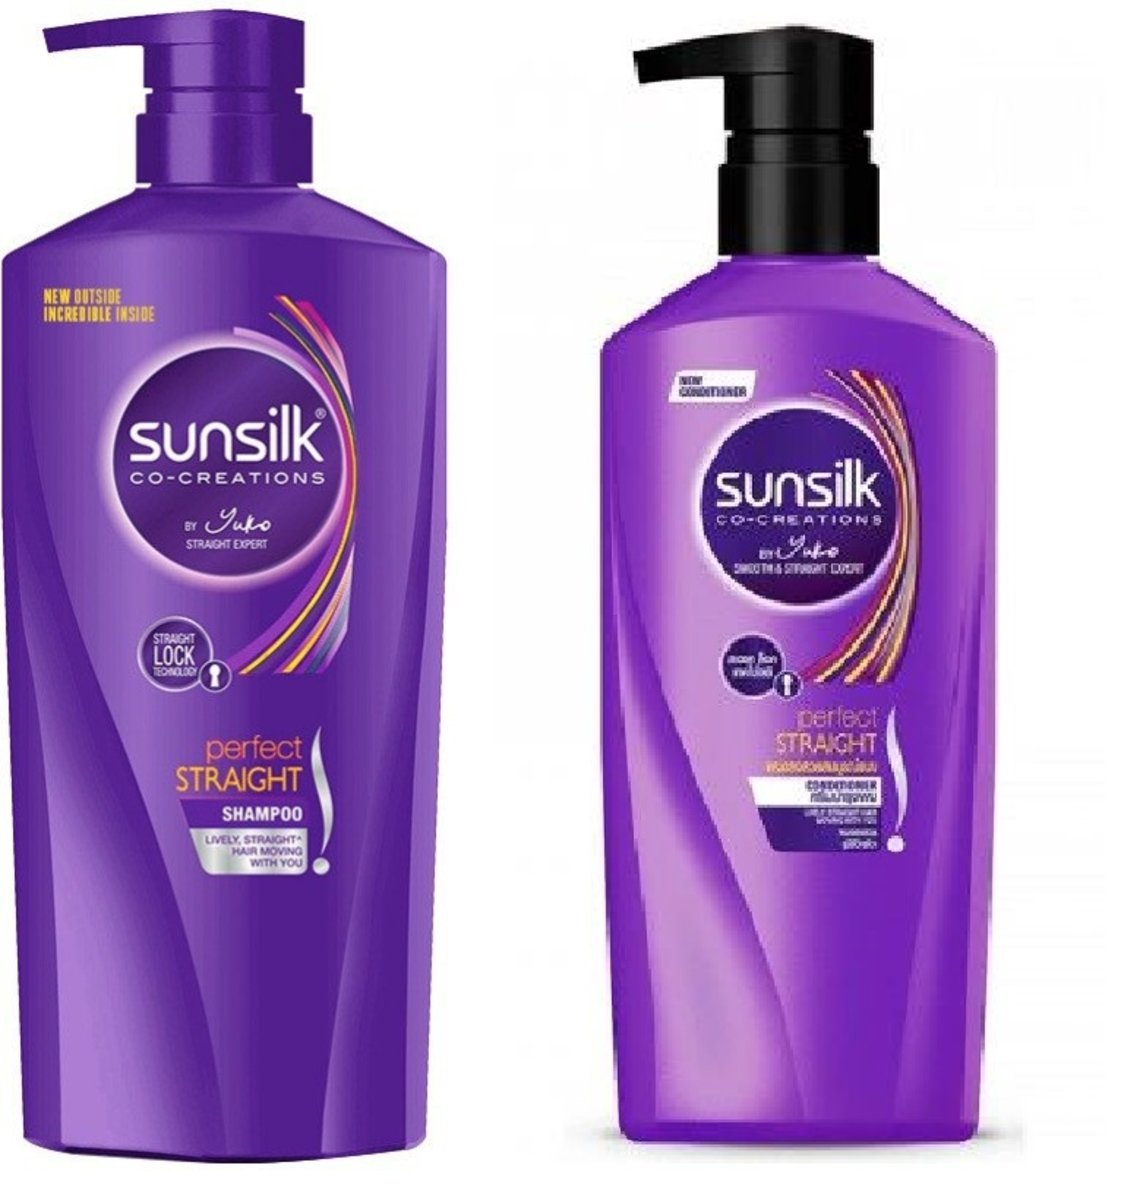 Perfect Straight Hair Conditioner 650ml + Shampoo 650ml